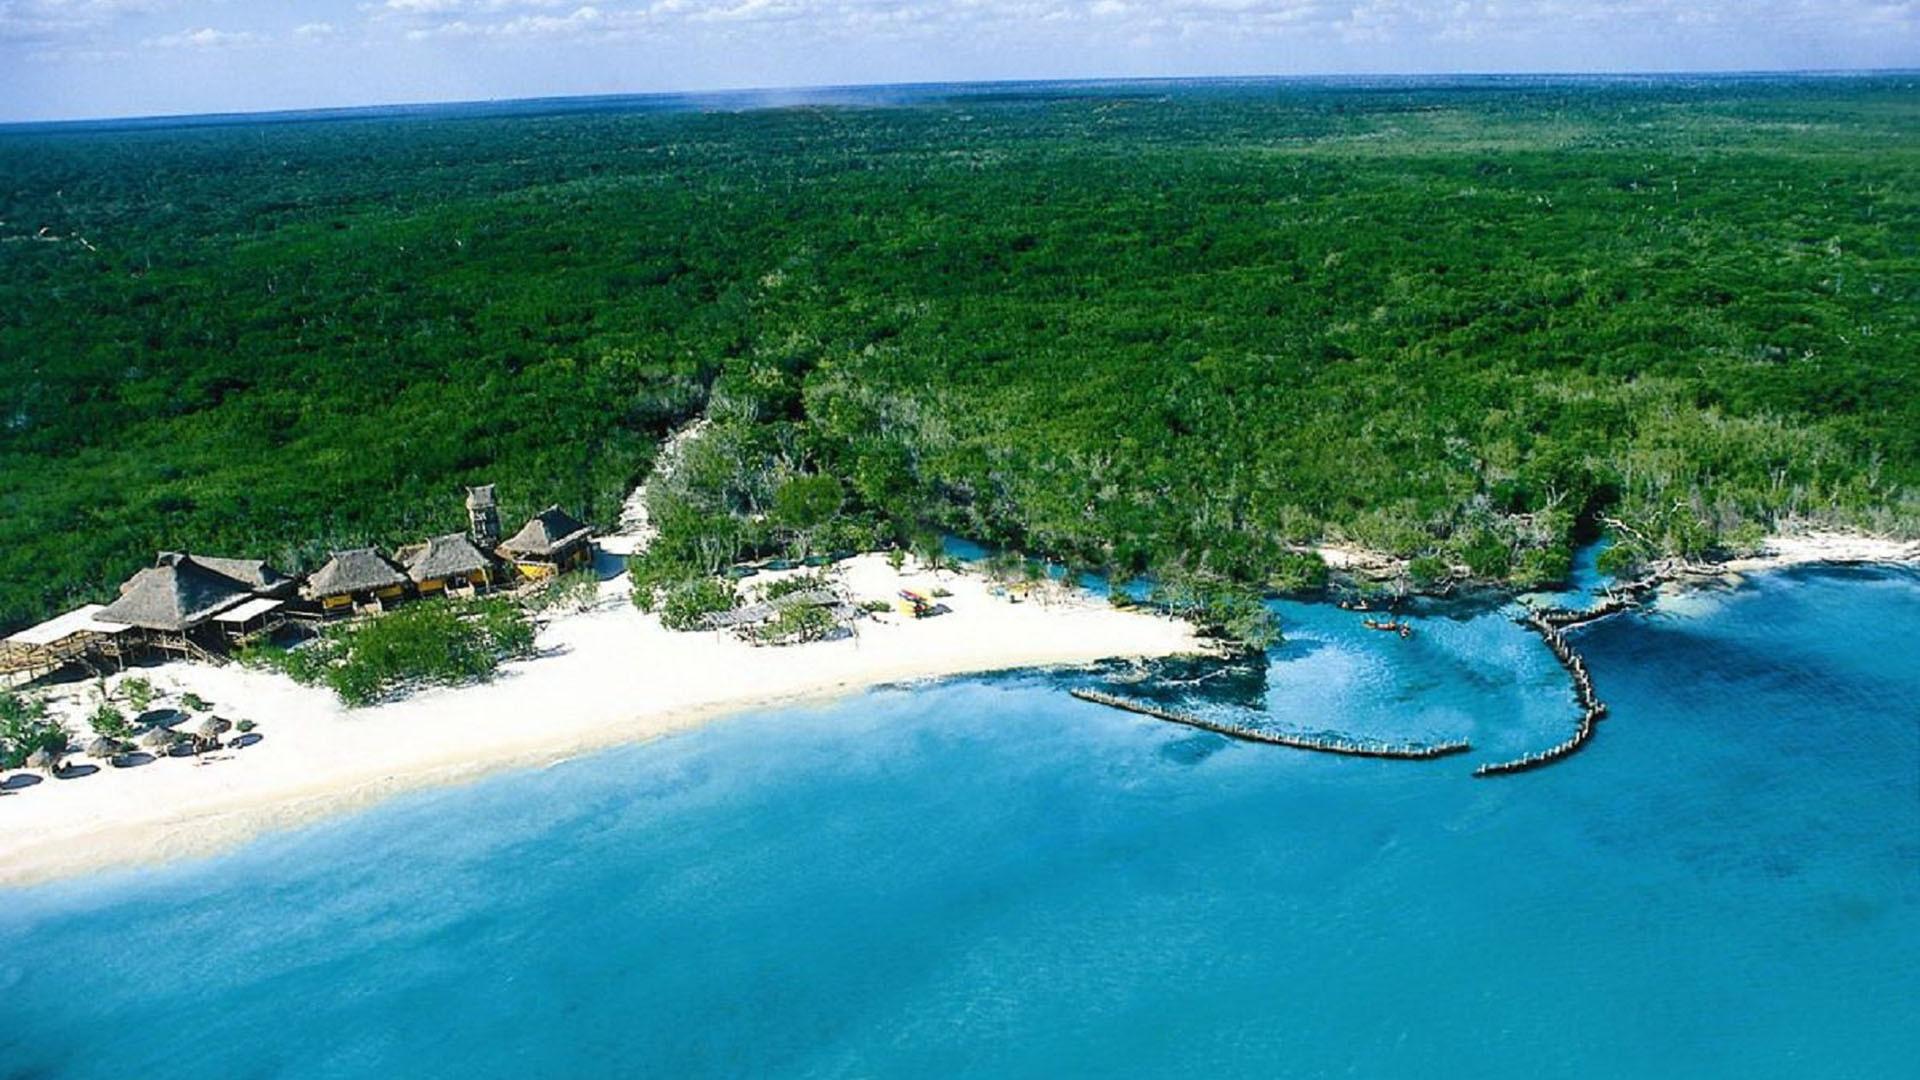 Sunny beach in panama